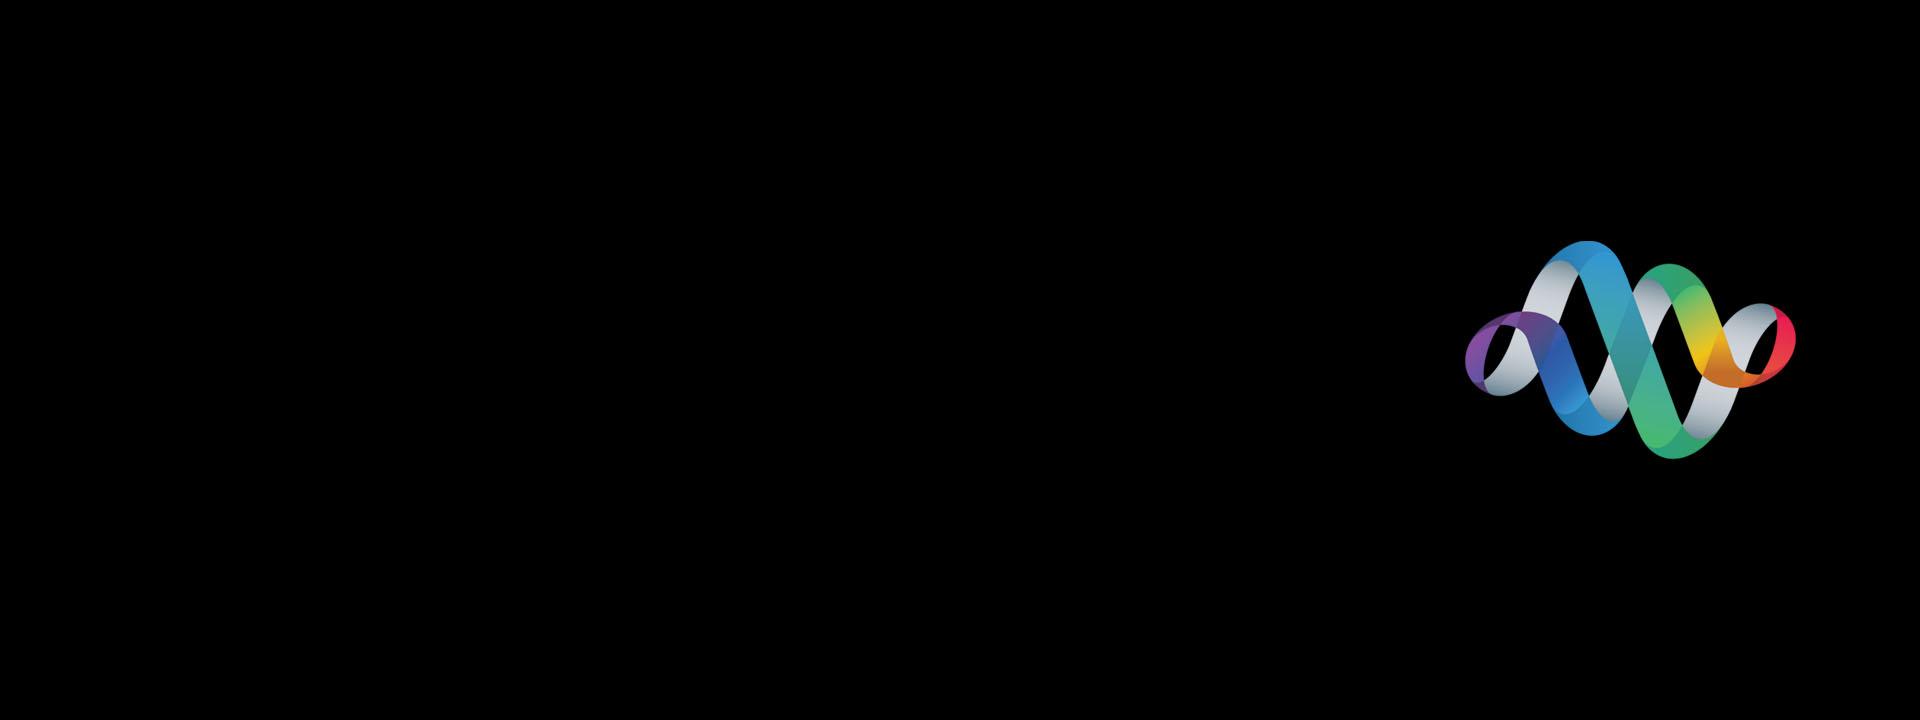 Semantic Machines header with logo